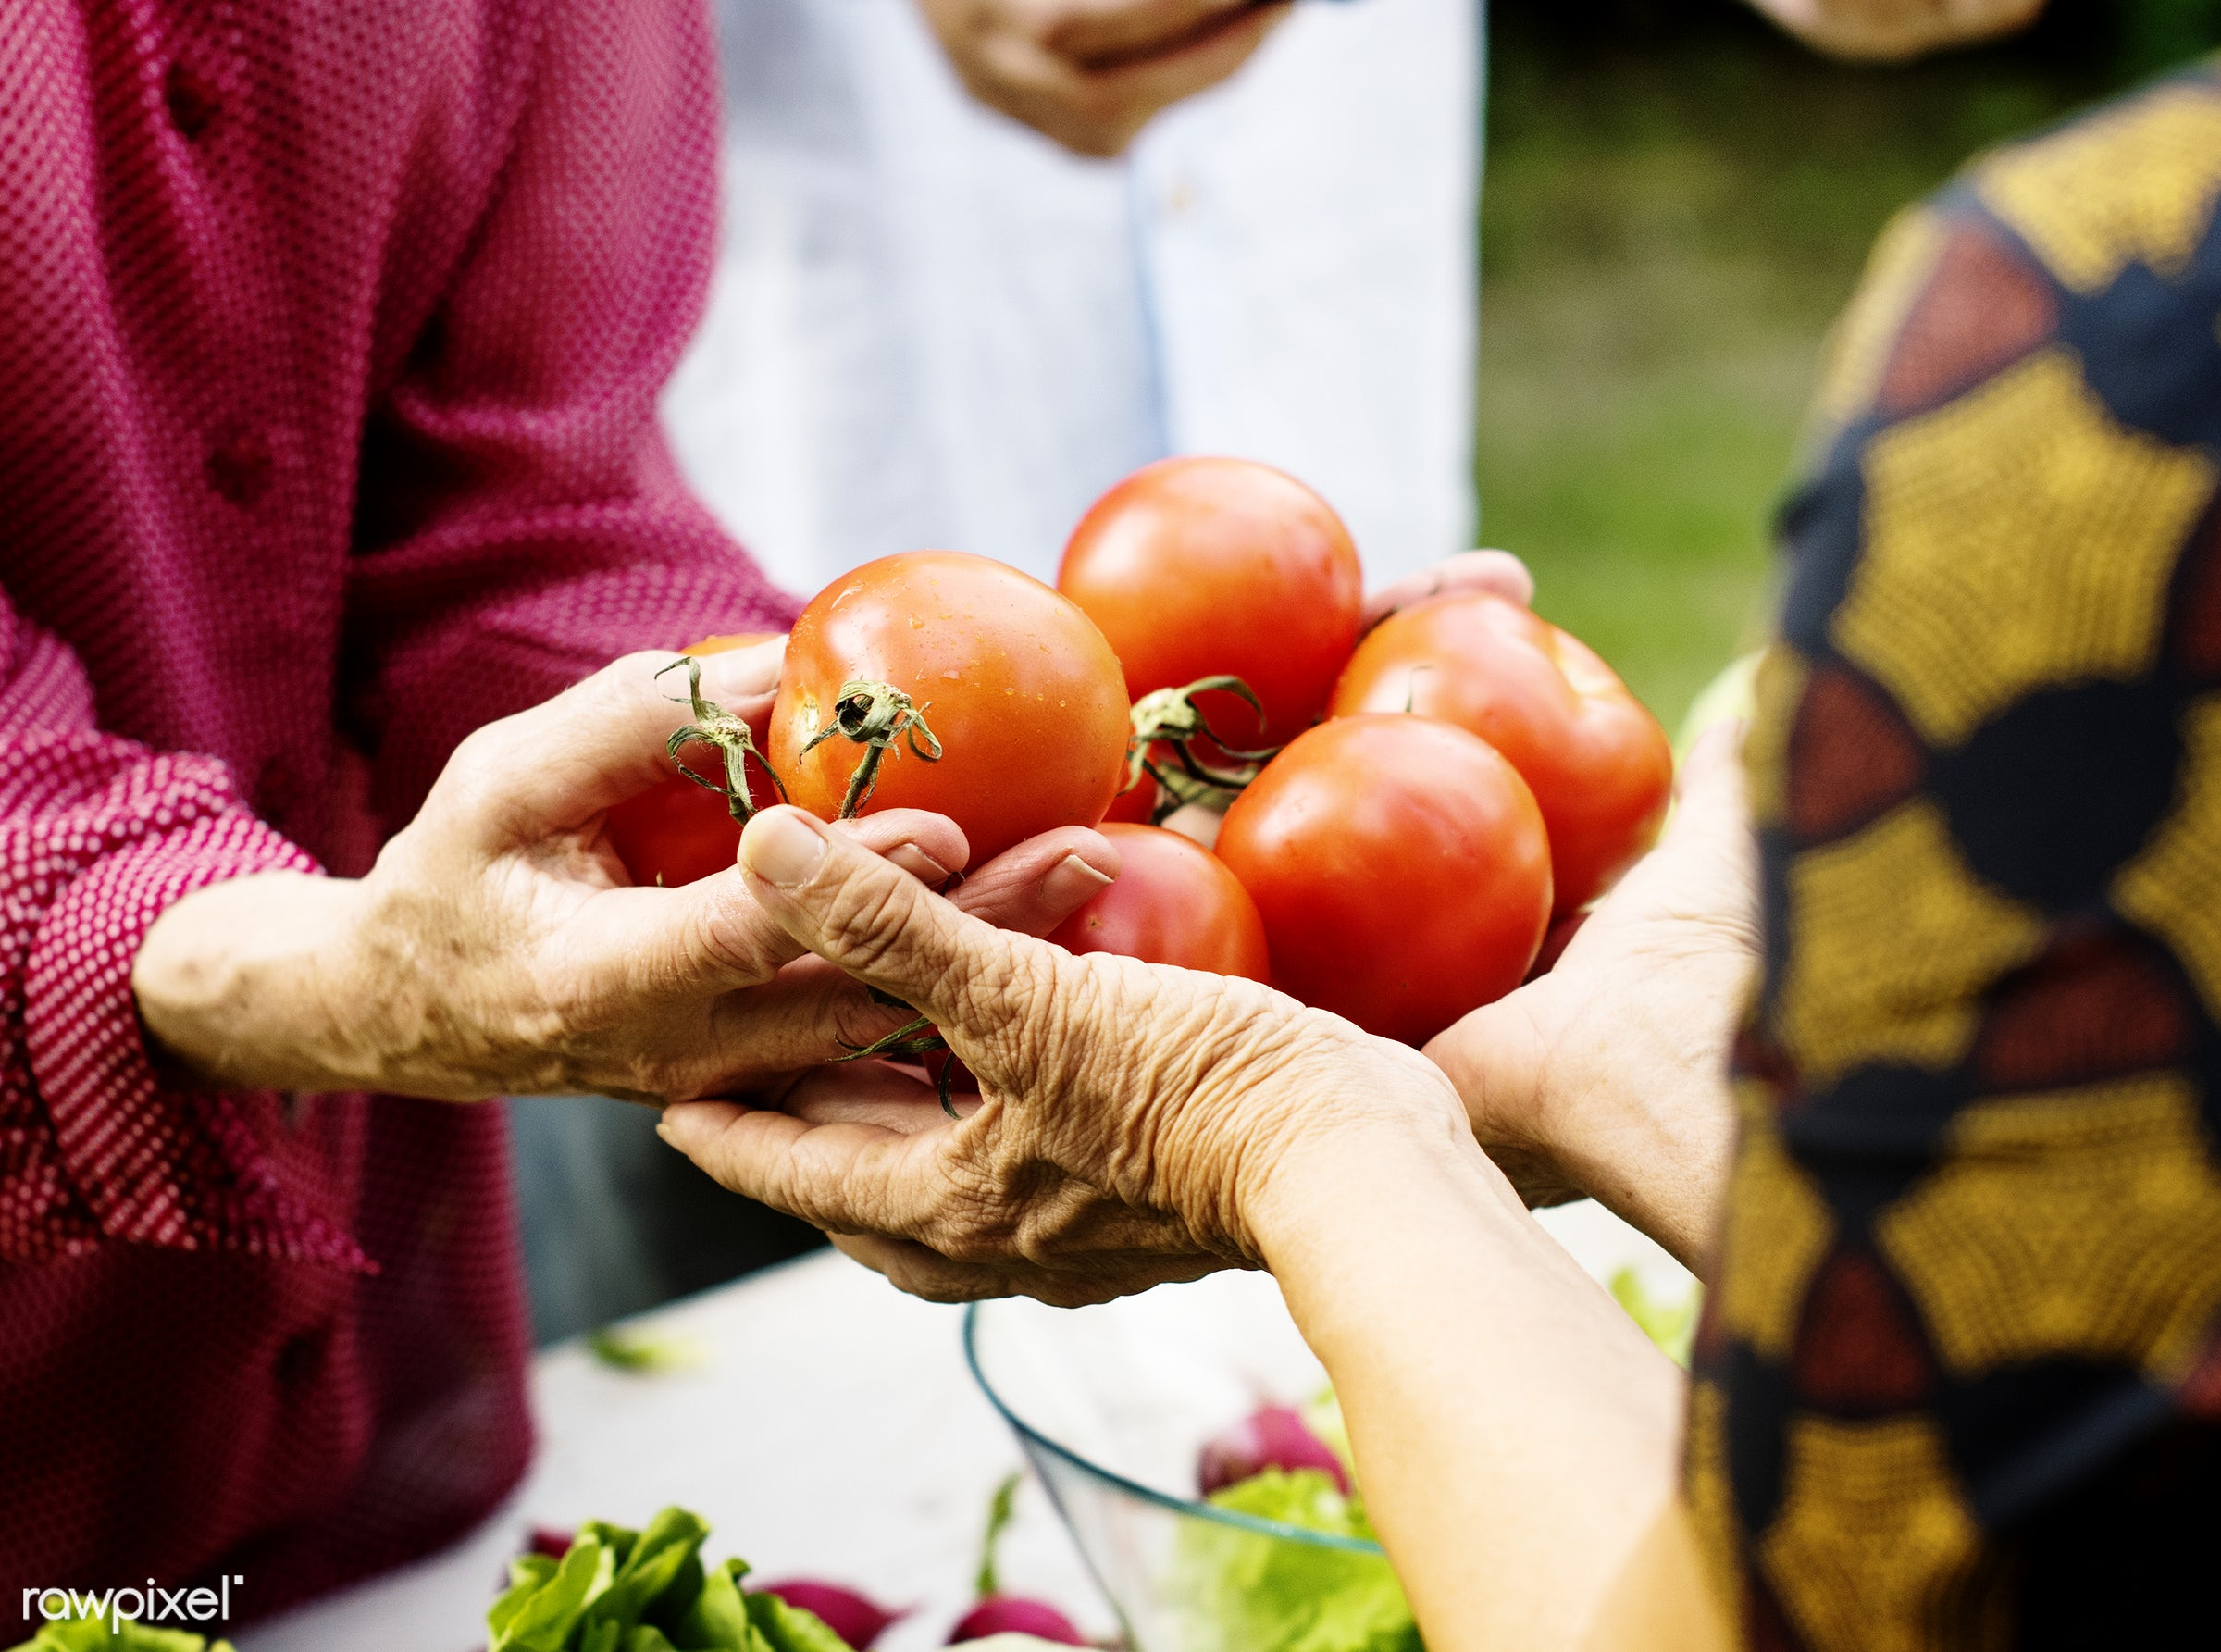 Fresh tomatoes - raw, tomato, holding, kind, nature, hands, fresh, ingredient, closeup, green, culinary, veggies, edible,...